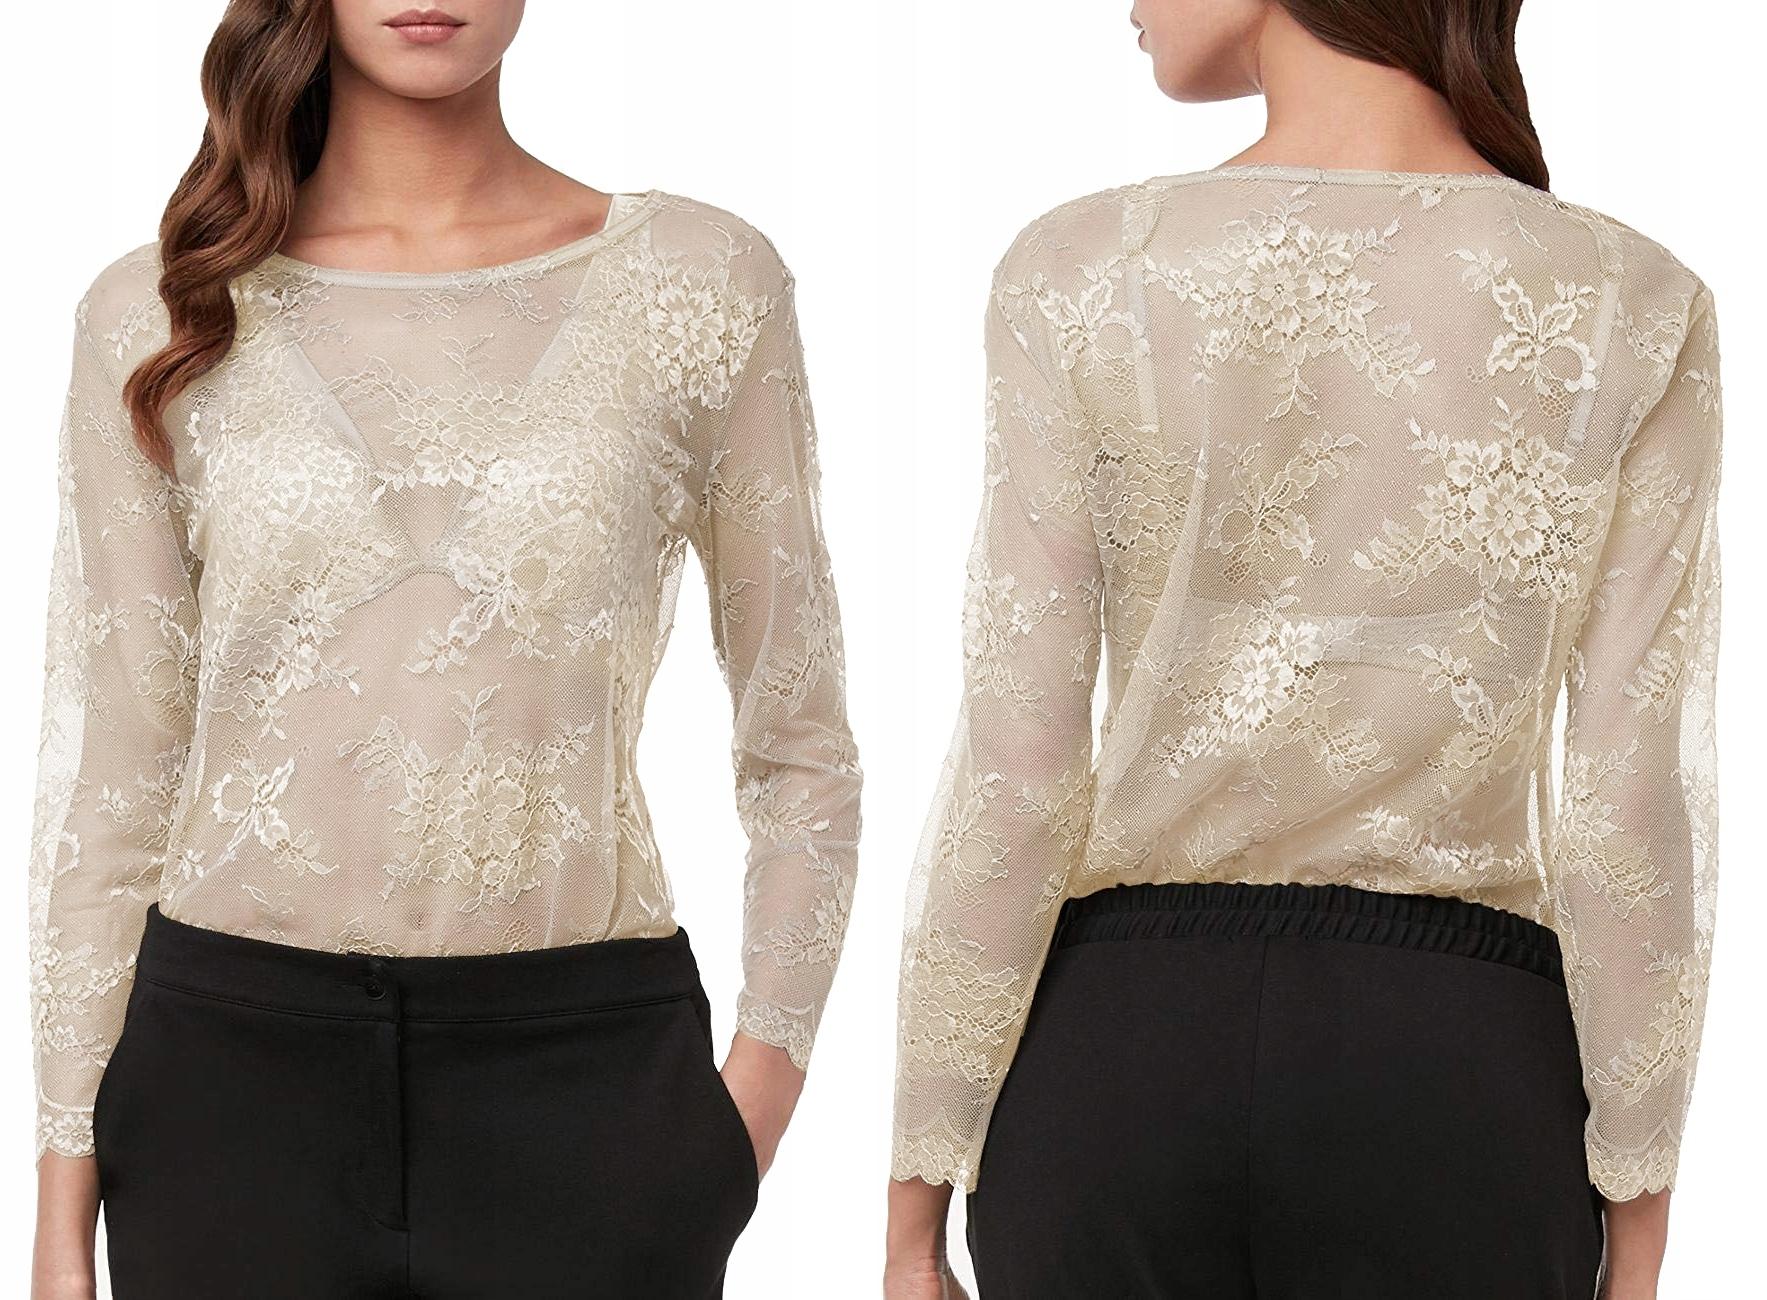 Intimissimi bluzka tunika koronkowa beżowa L